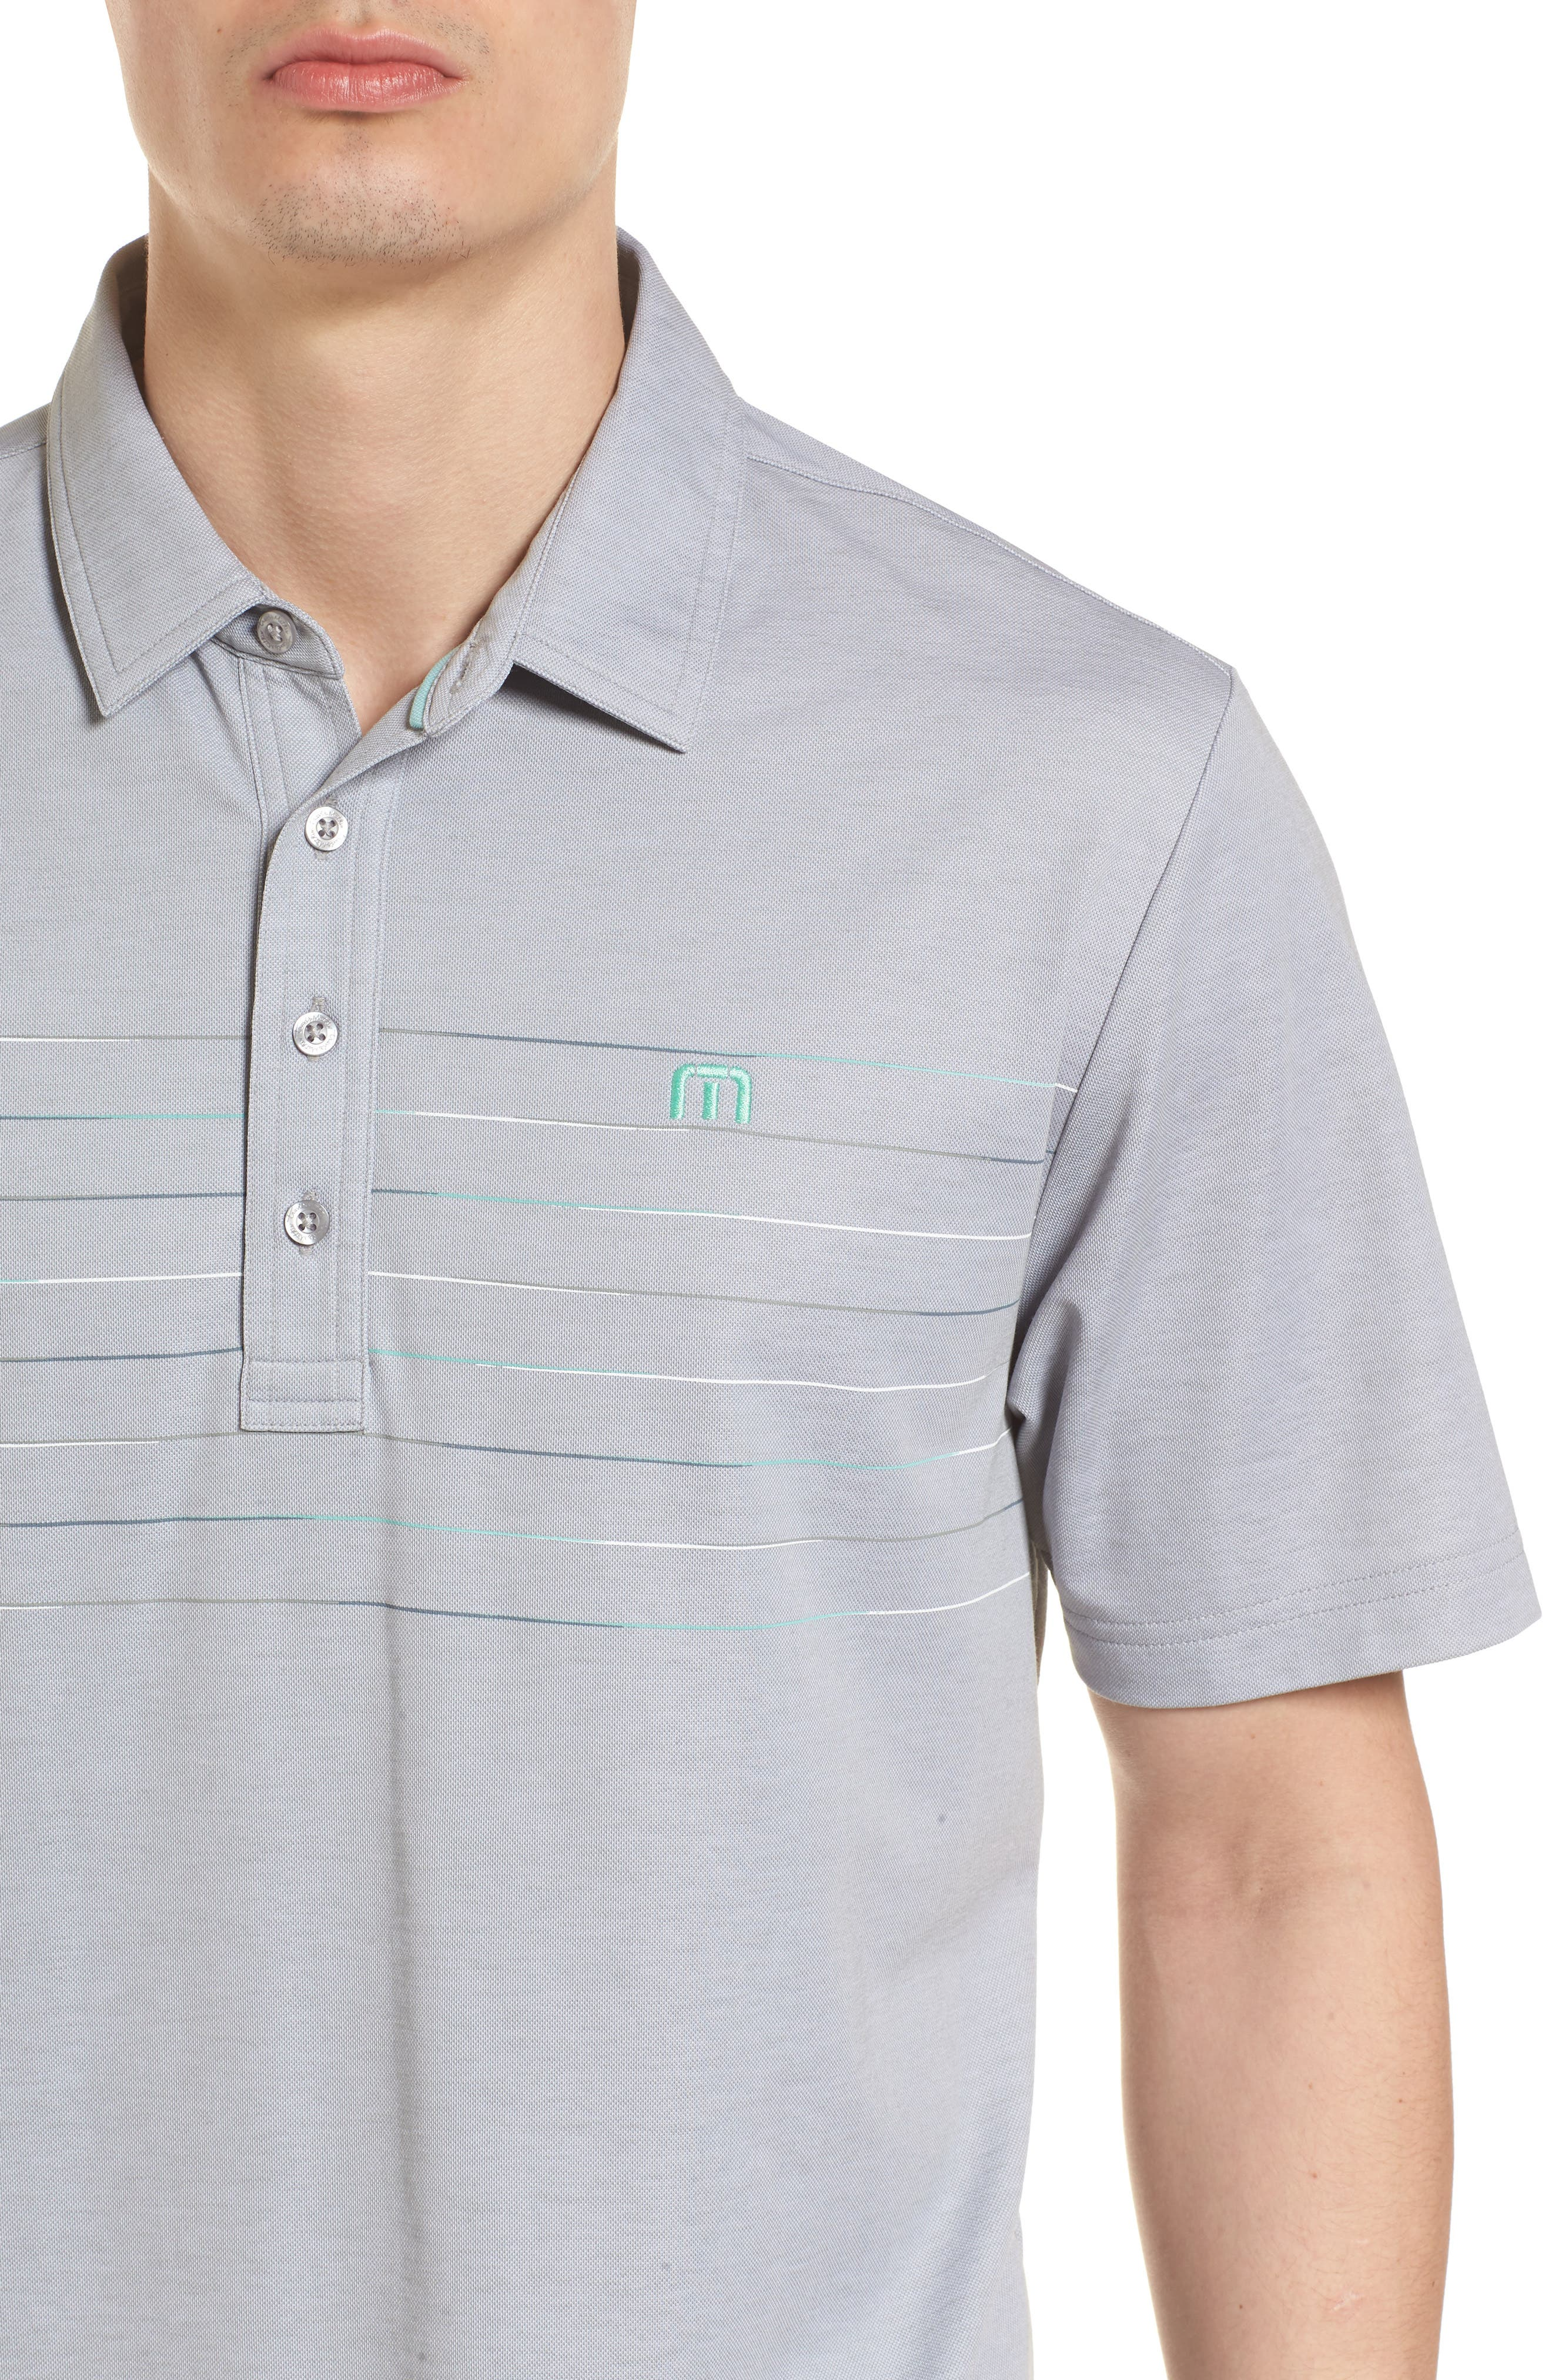 Good Good Polo Shirt,                             Alternate thumbnail 4, color,                             020